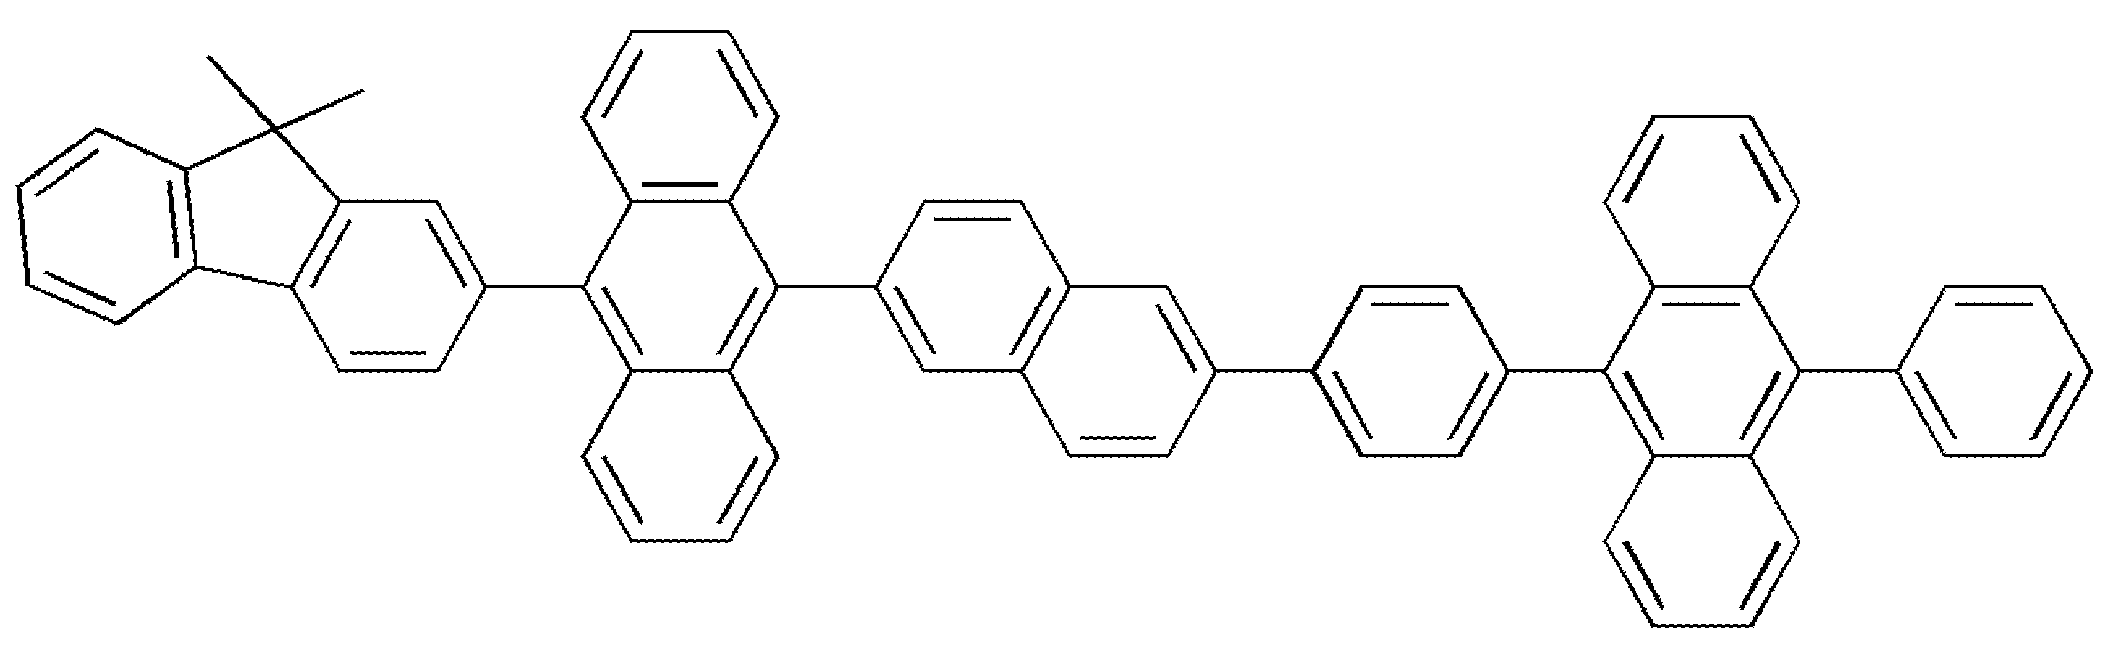 Figure 112007087103673-pat00670